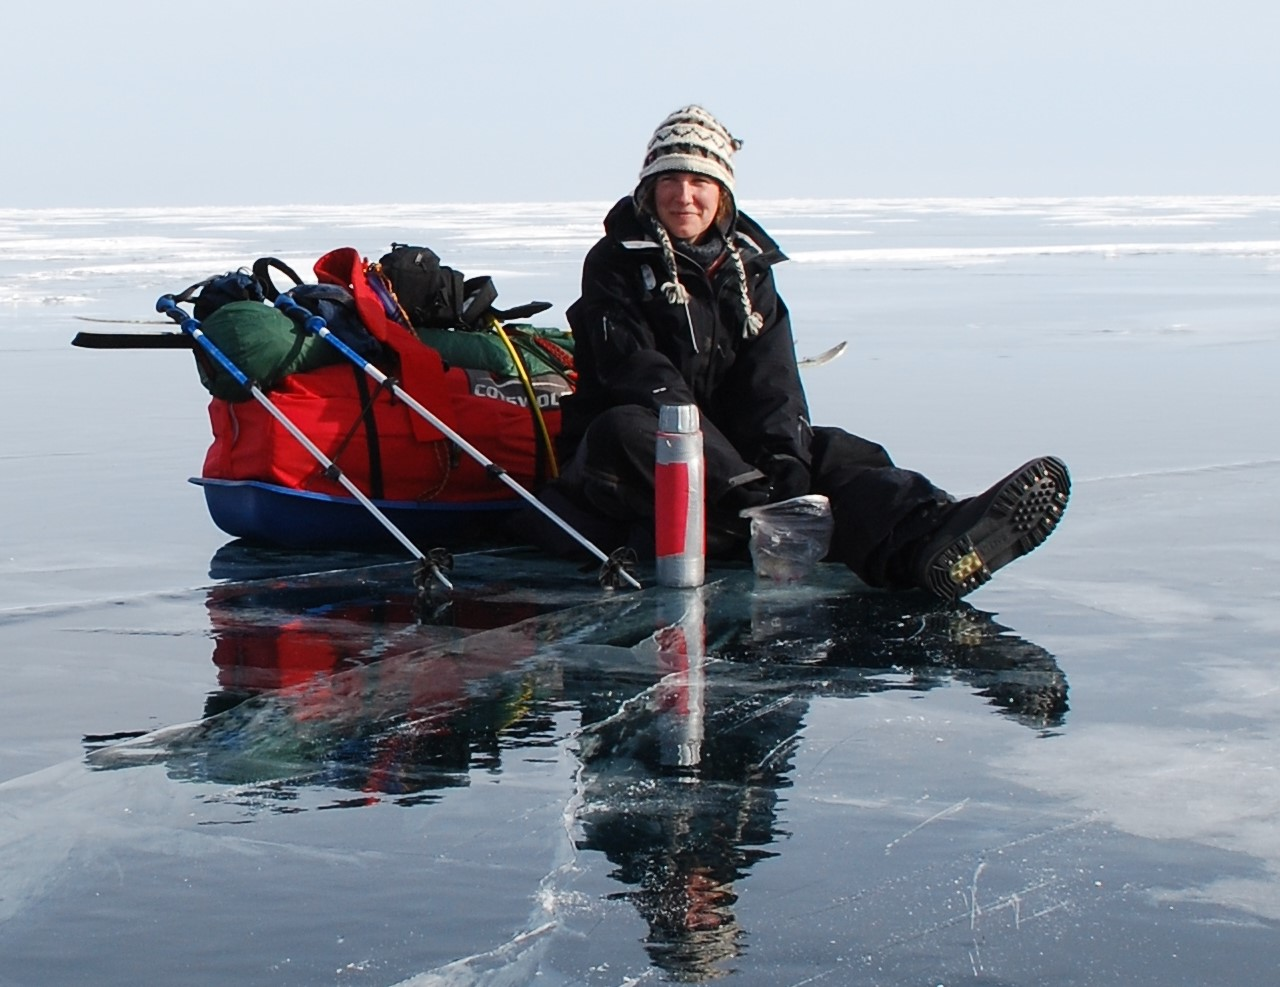 Felicity Aston, 2014 Courage Award; First woman to ski alone across Antarctica